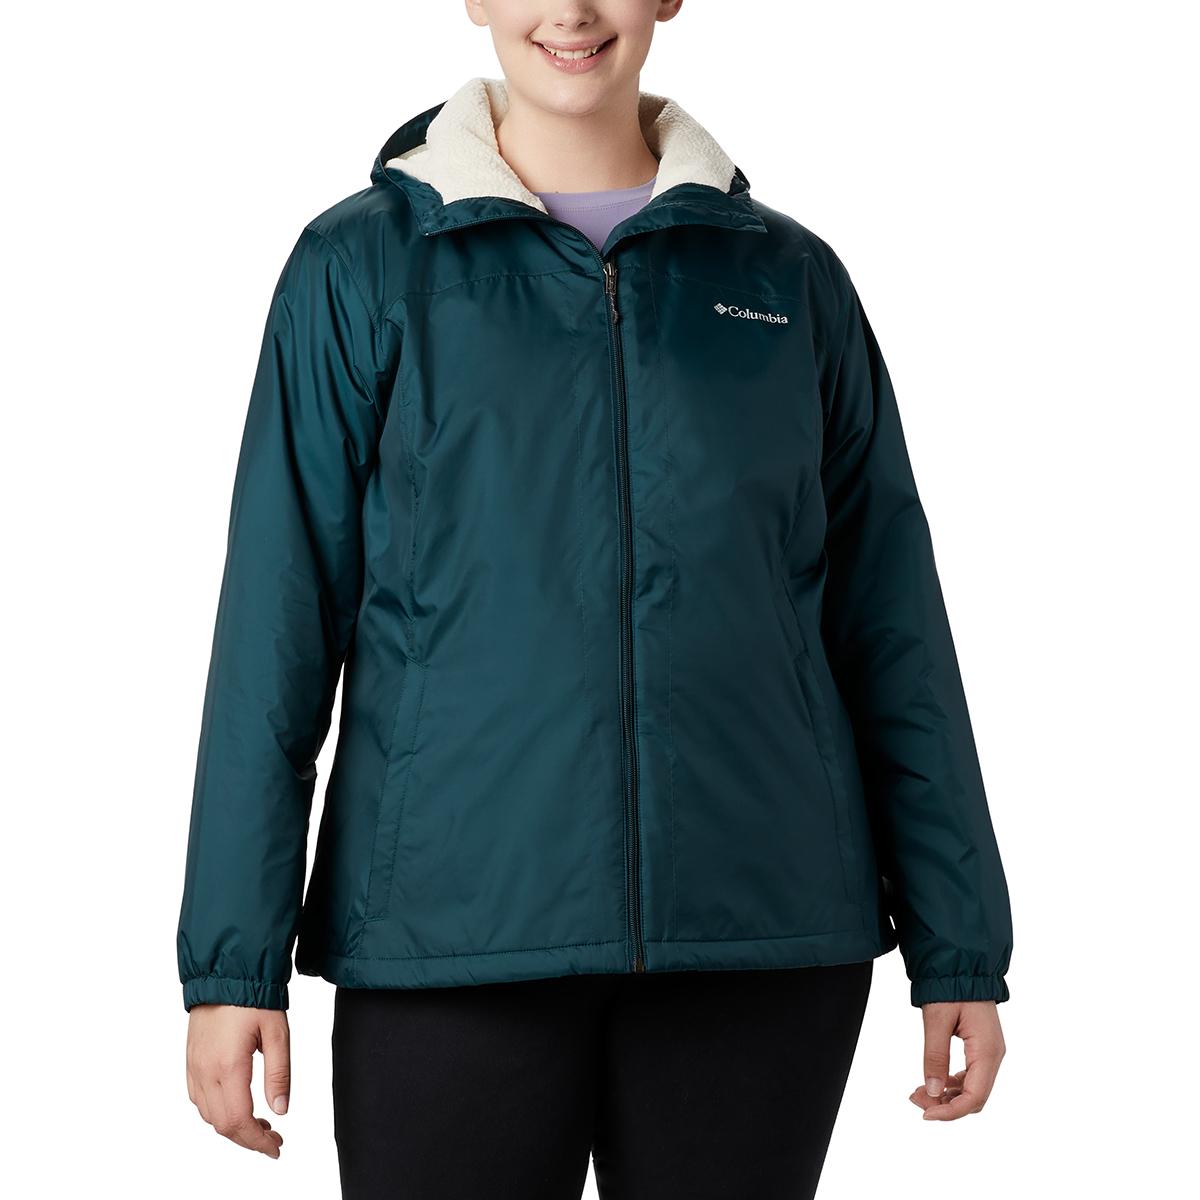 Columbia Women's Switchback Sherpa Lined Jacket - Blue, M